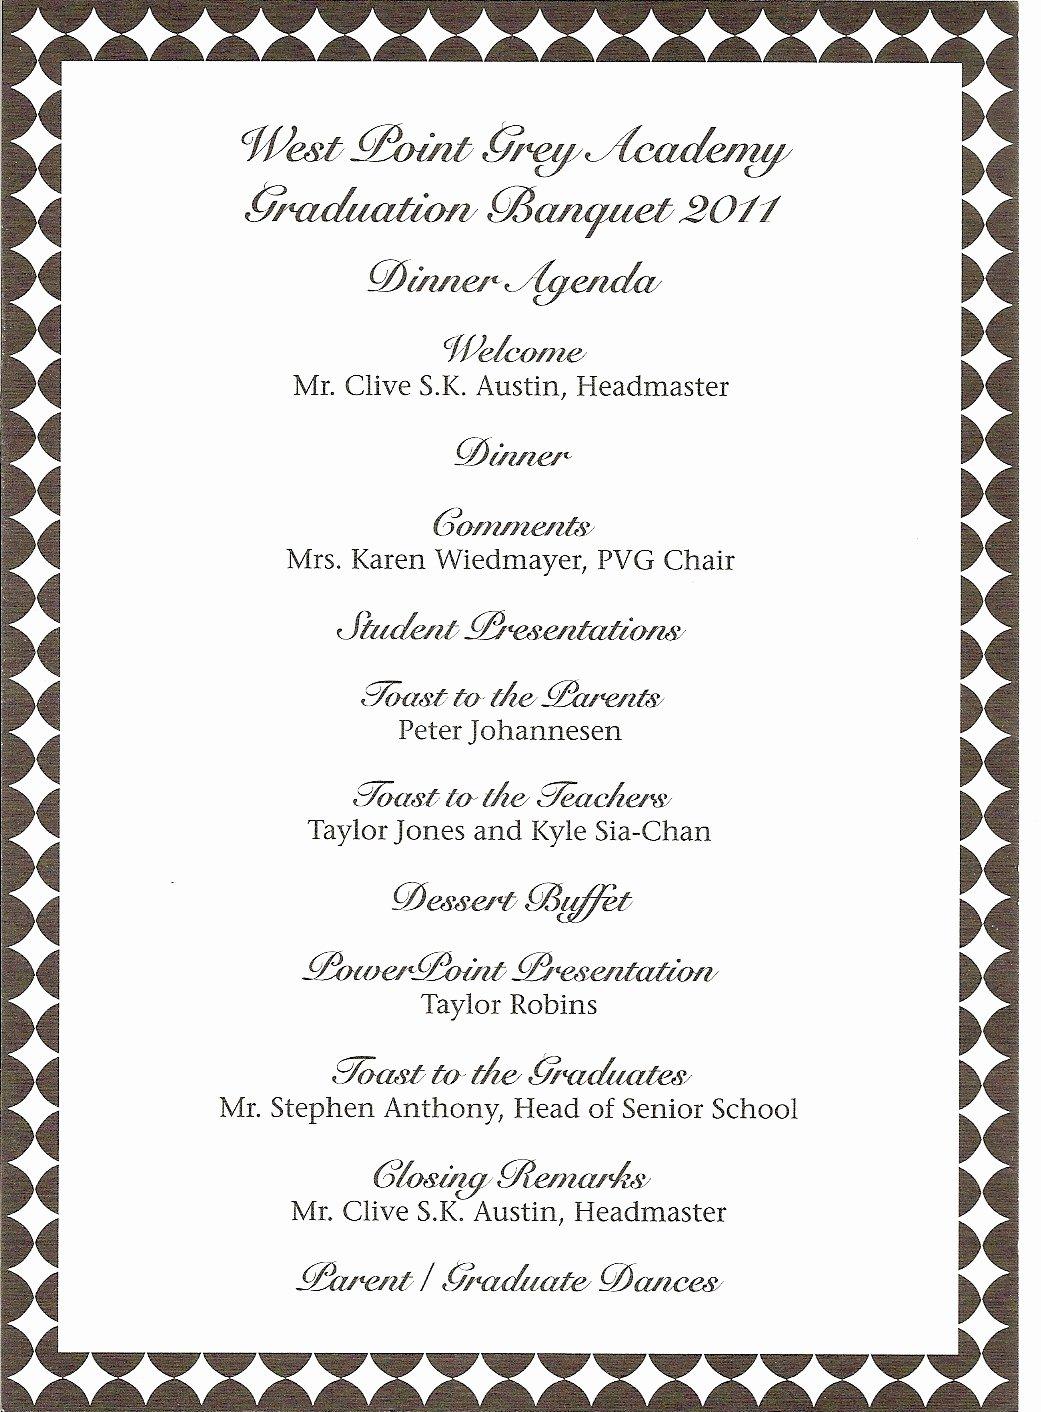 Family Reunion Program Template Fresh Donna S Report Wpga Graduation Banquet Teddy